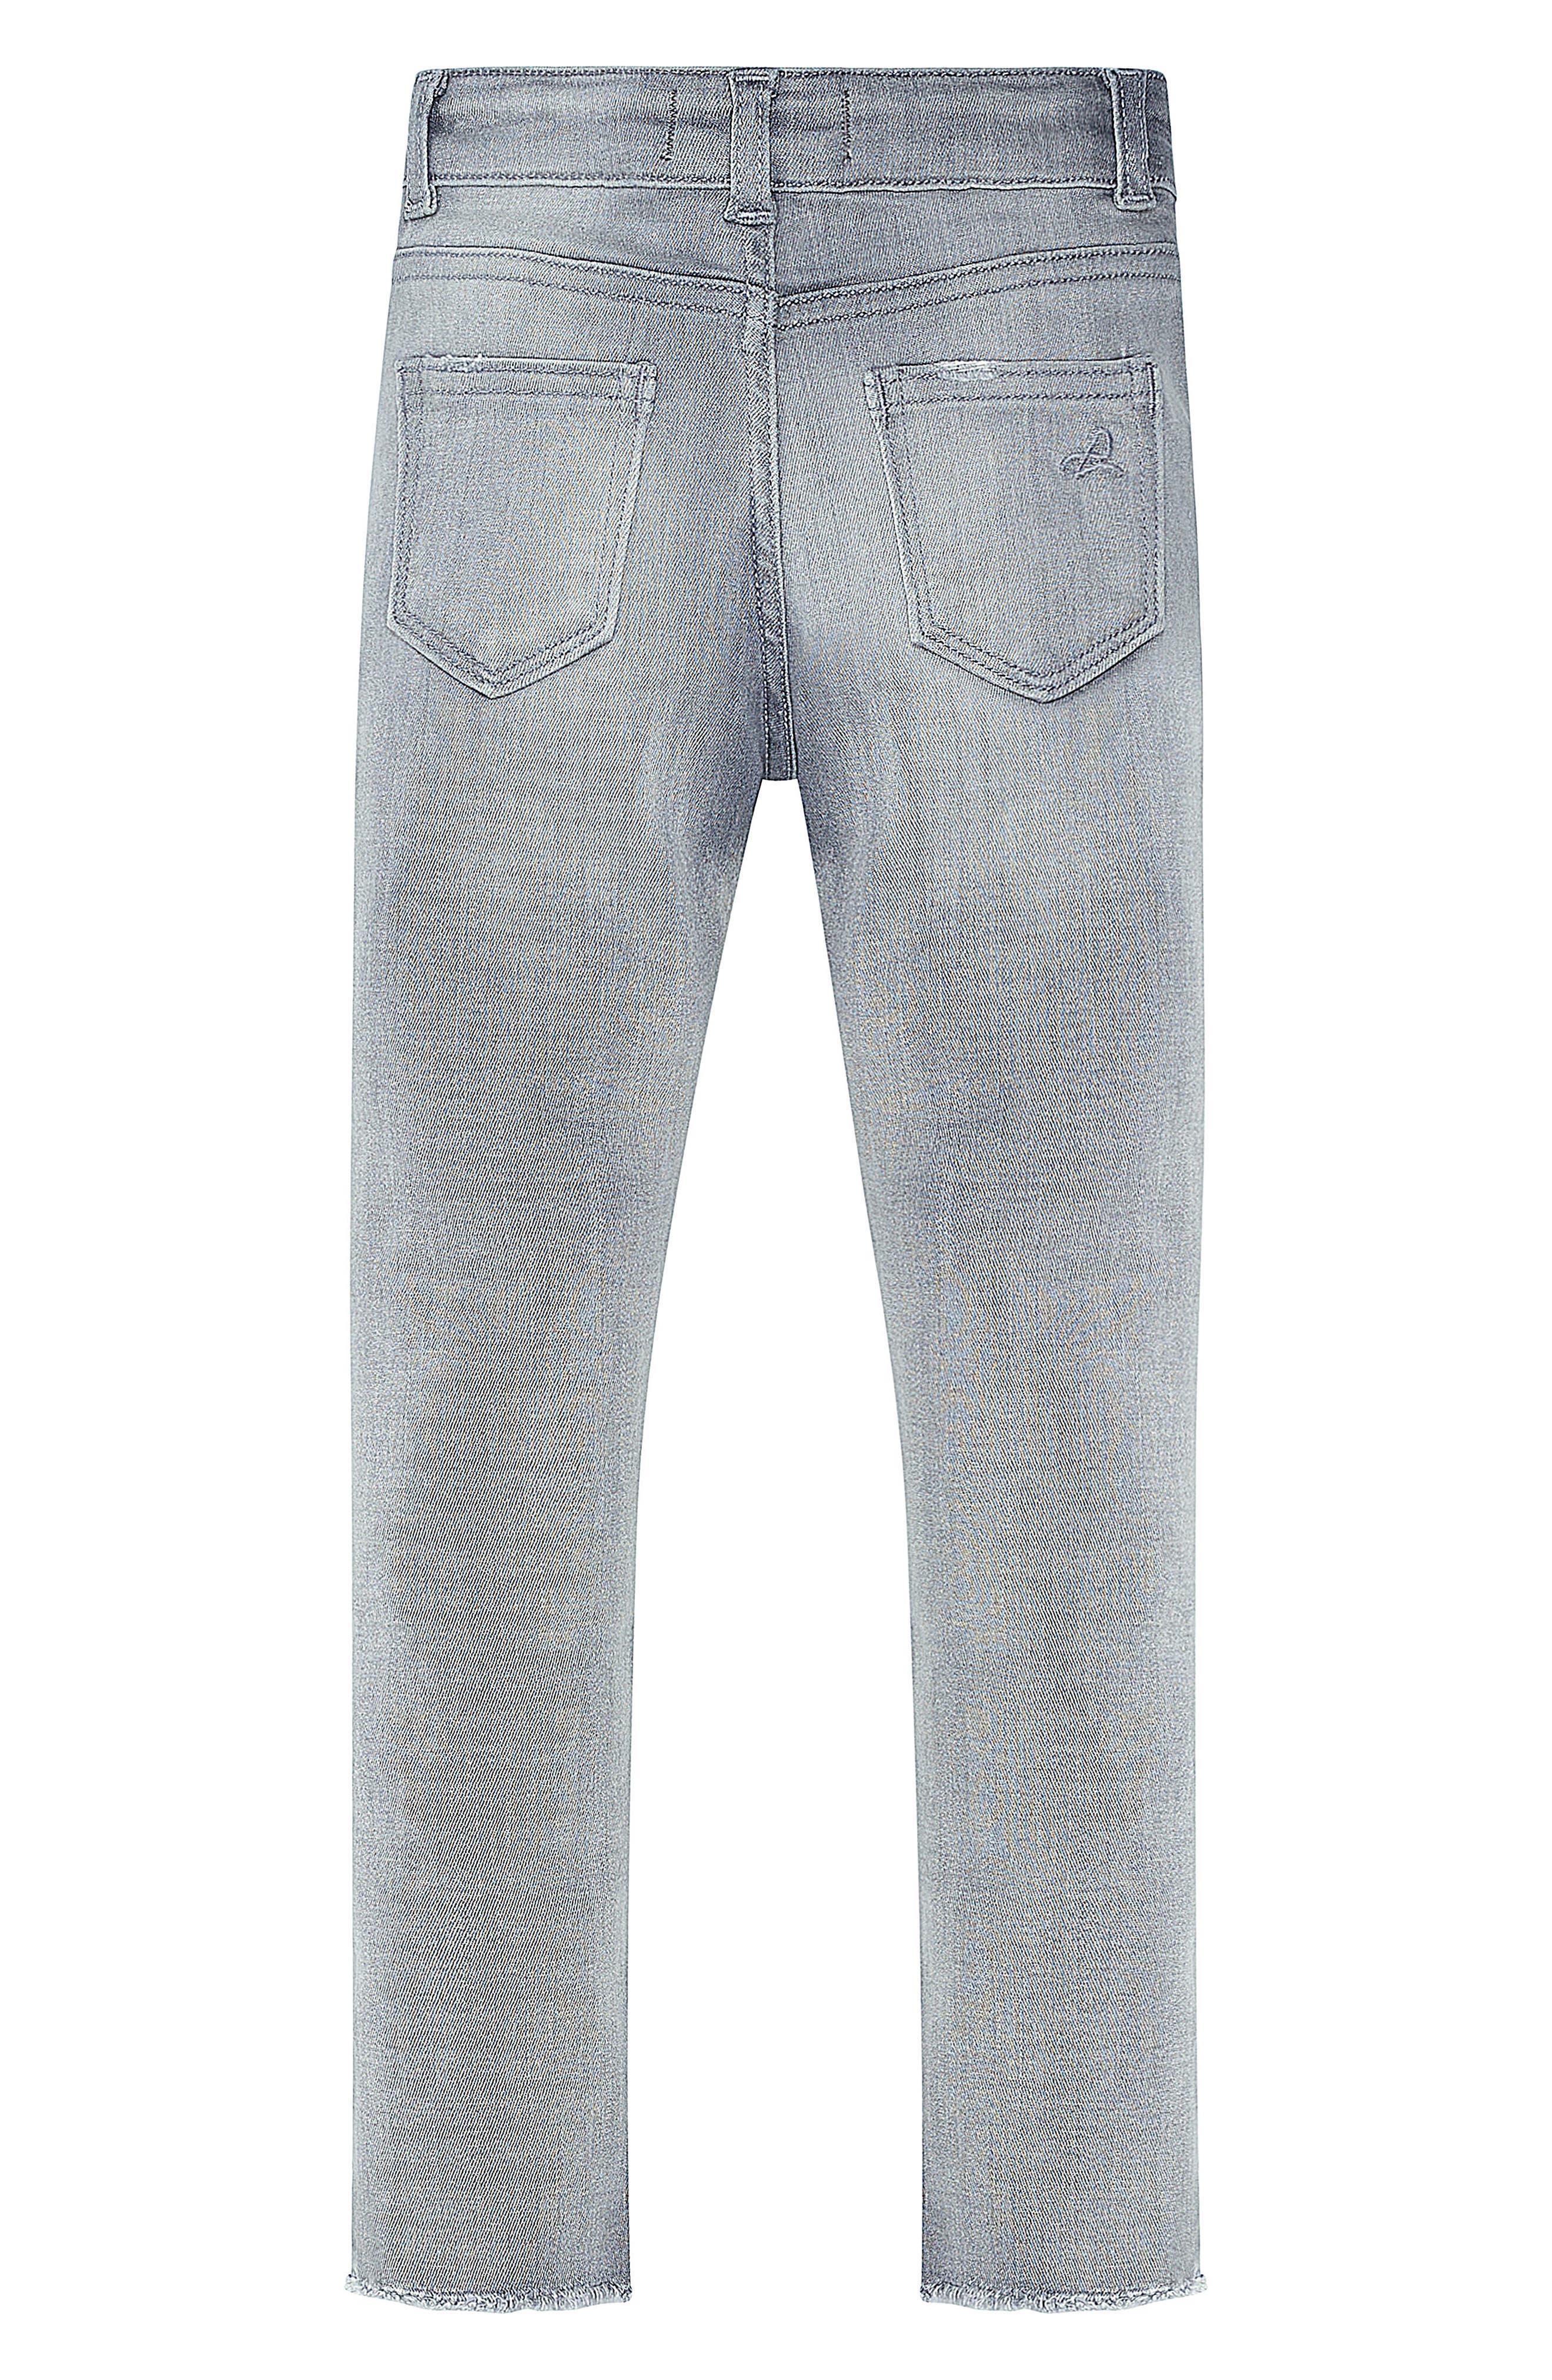 Skinny Jeans,                             Main thumbnail 1, color,                             HOWL